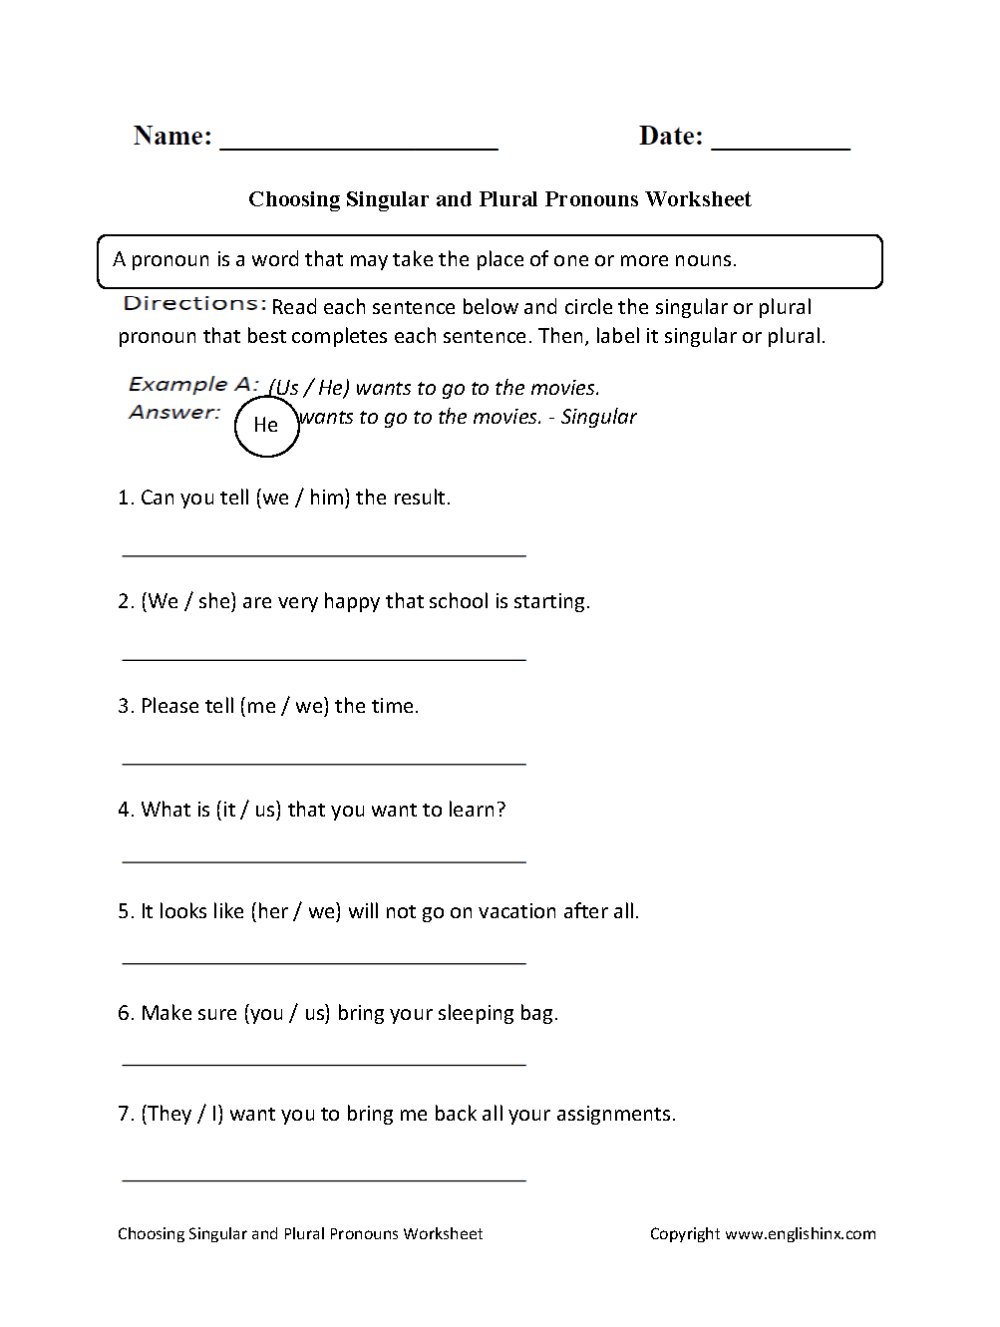 medium resolution of Singular and Plural Pronouns Worksheets   Choosing Singular or Plural Pronouns  Worksheet